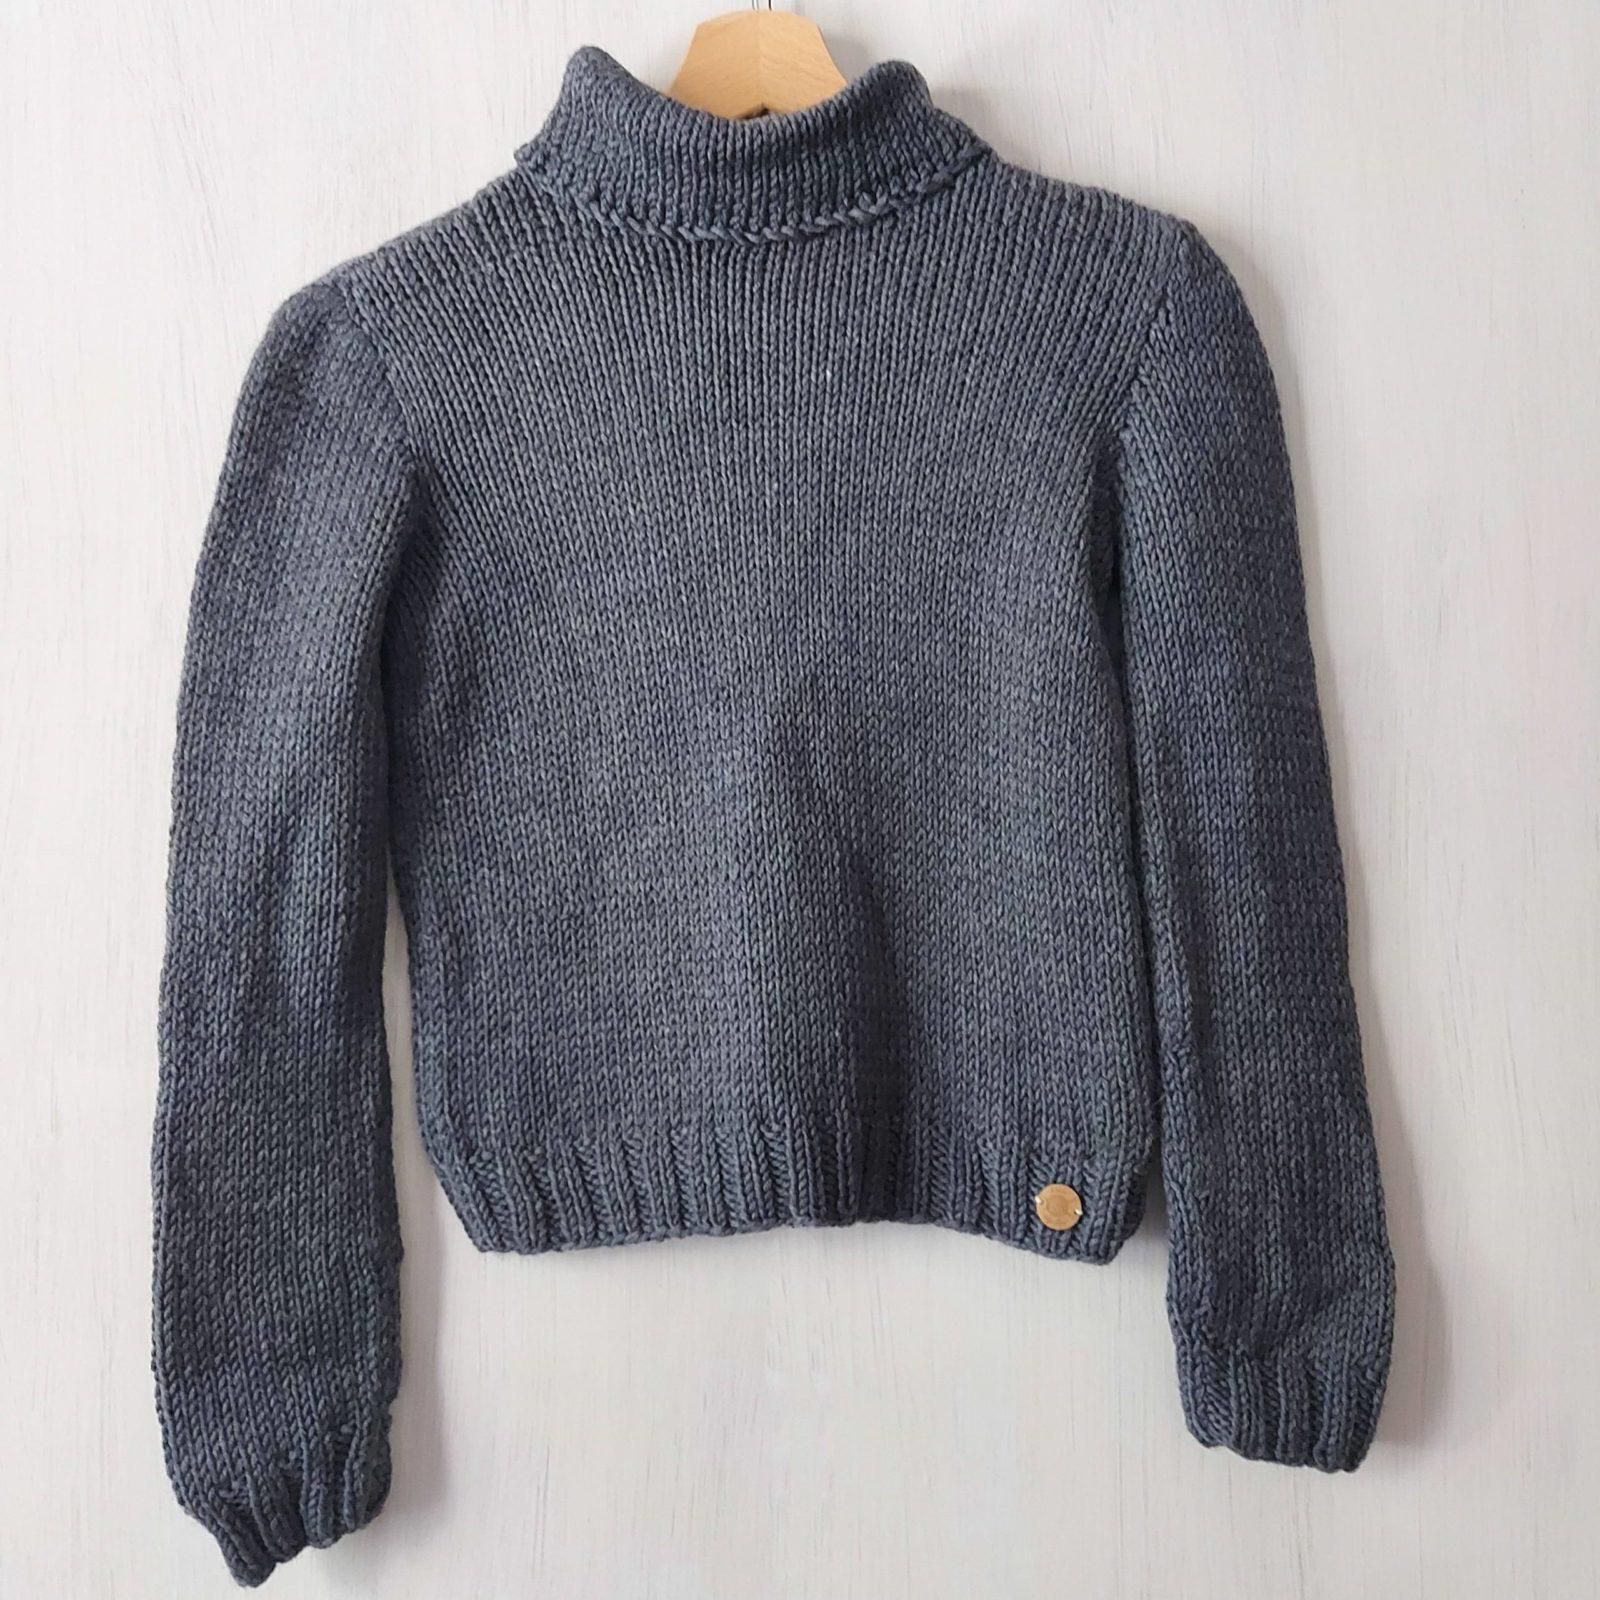 Pull-fait-main-modele-Ga-couleur-gris-11